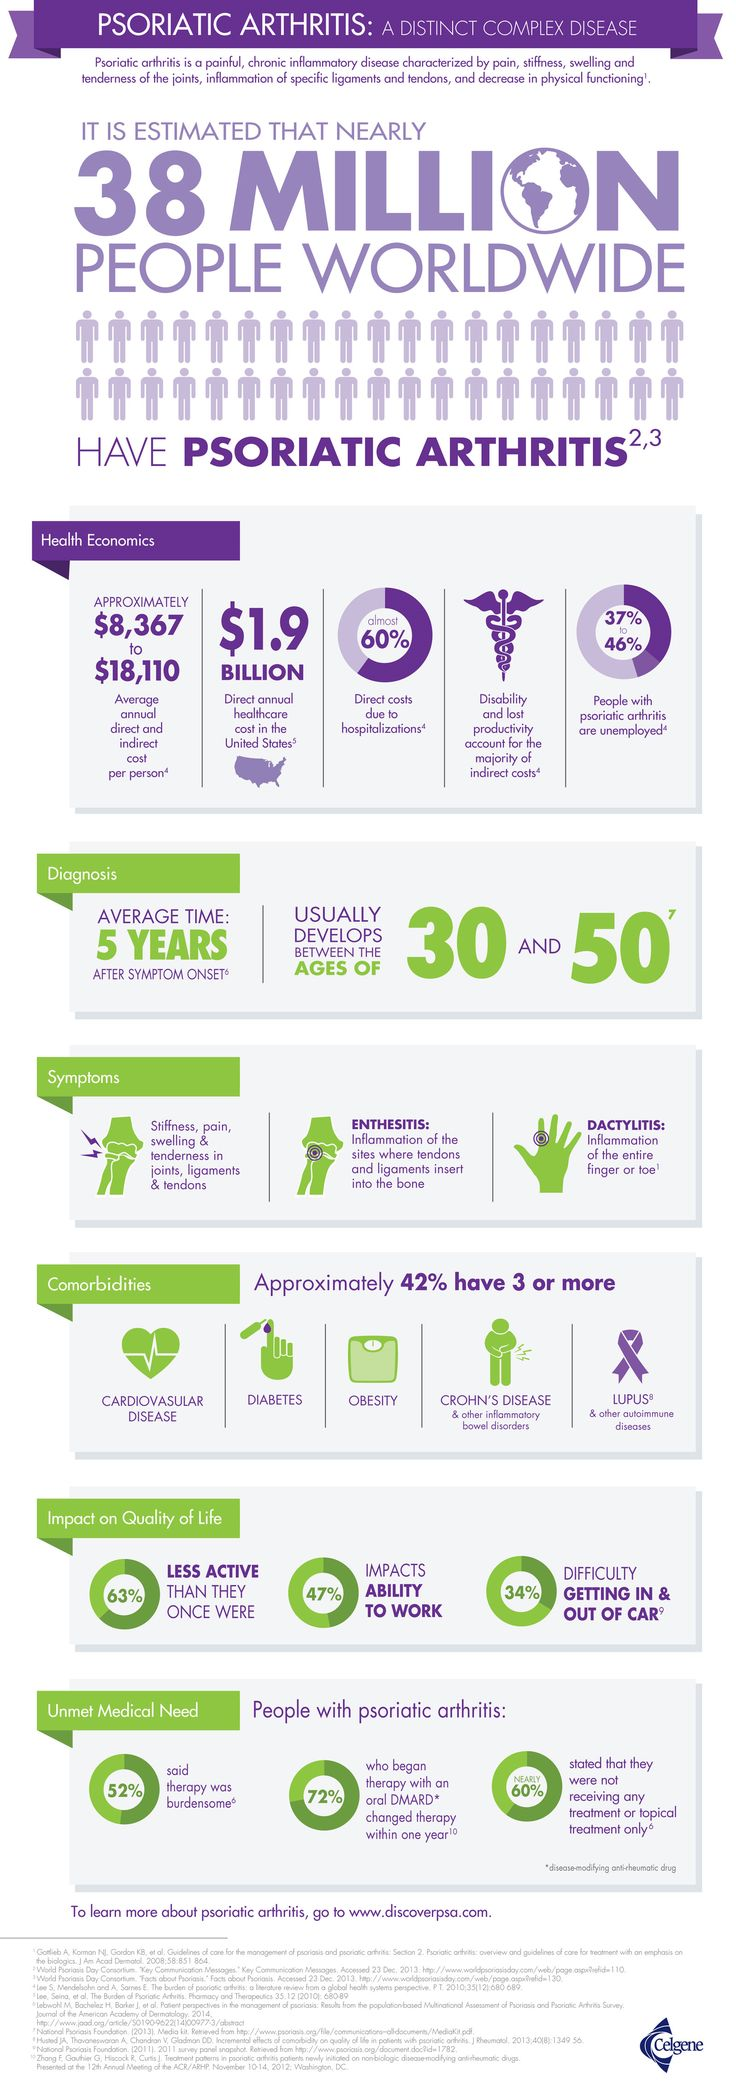 Psoriatic arthritis: a distinct complex disease [Infographic]